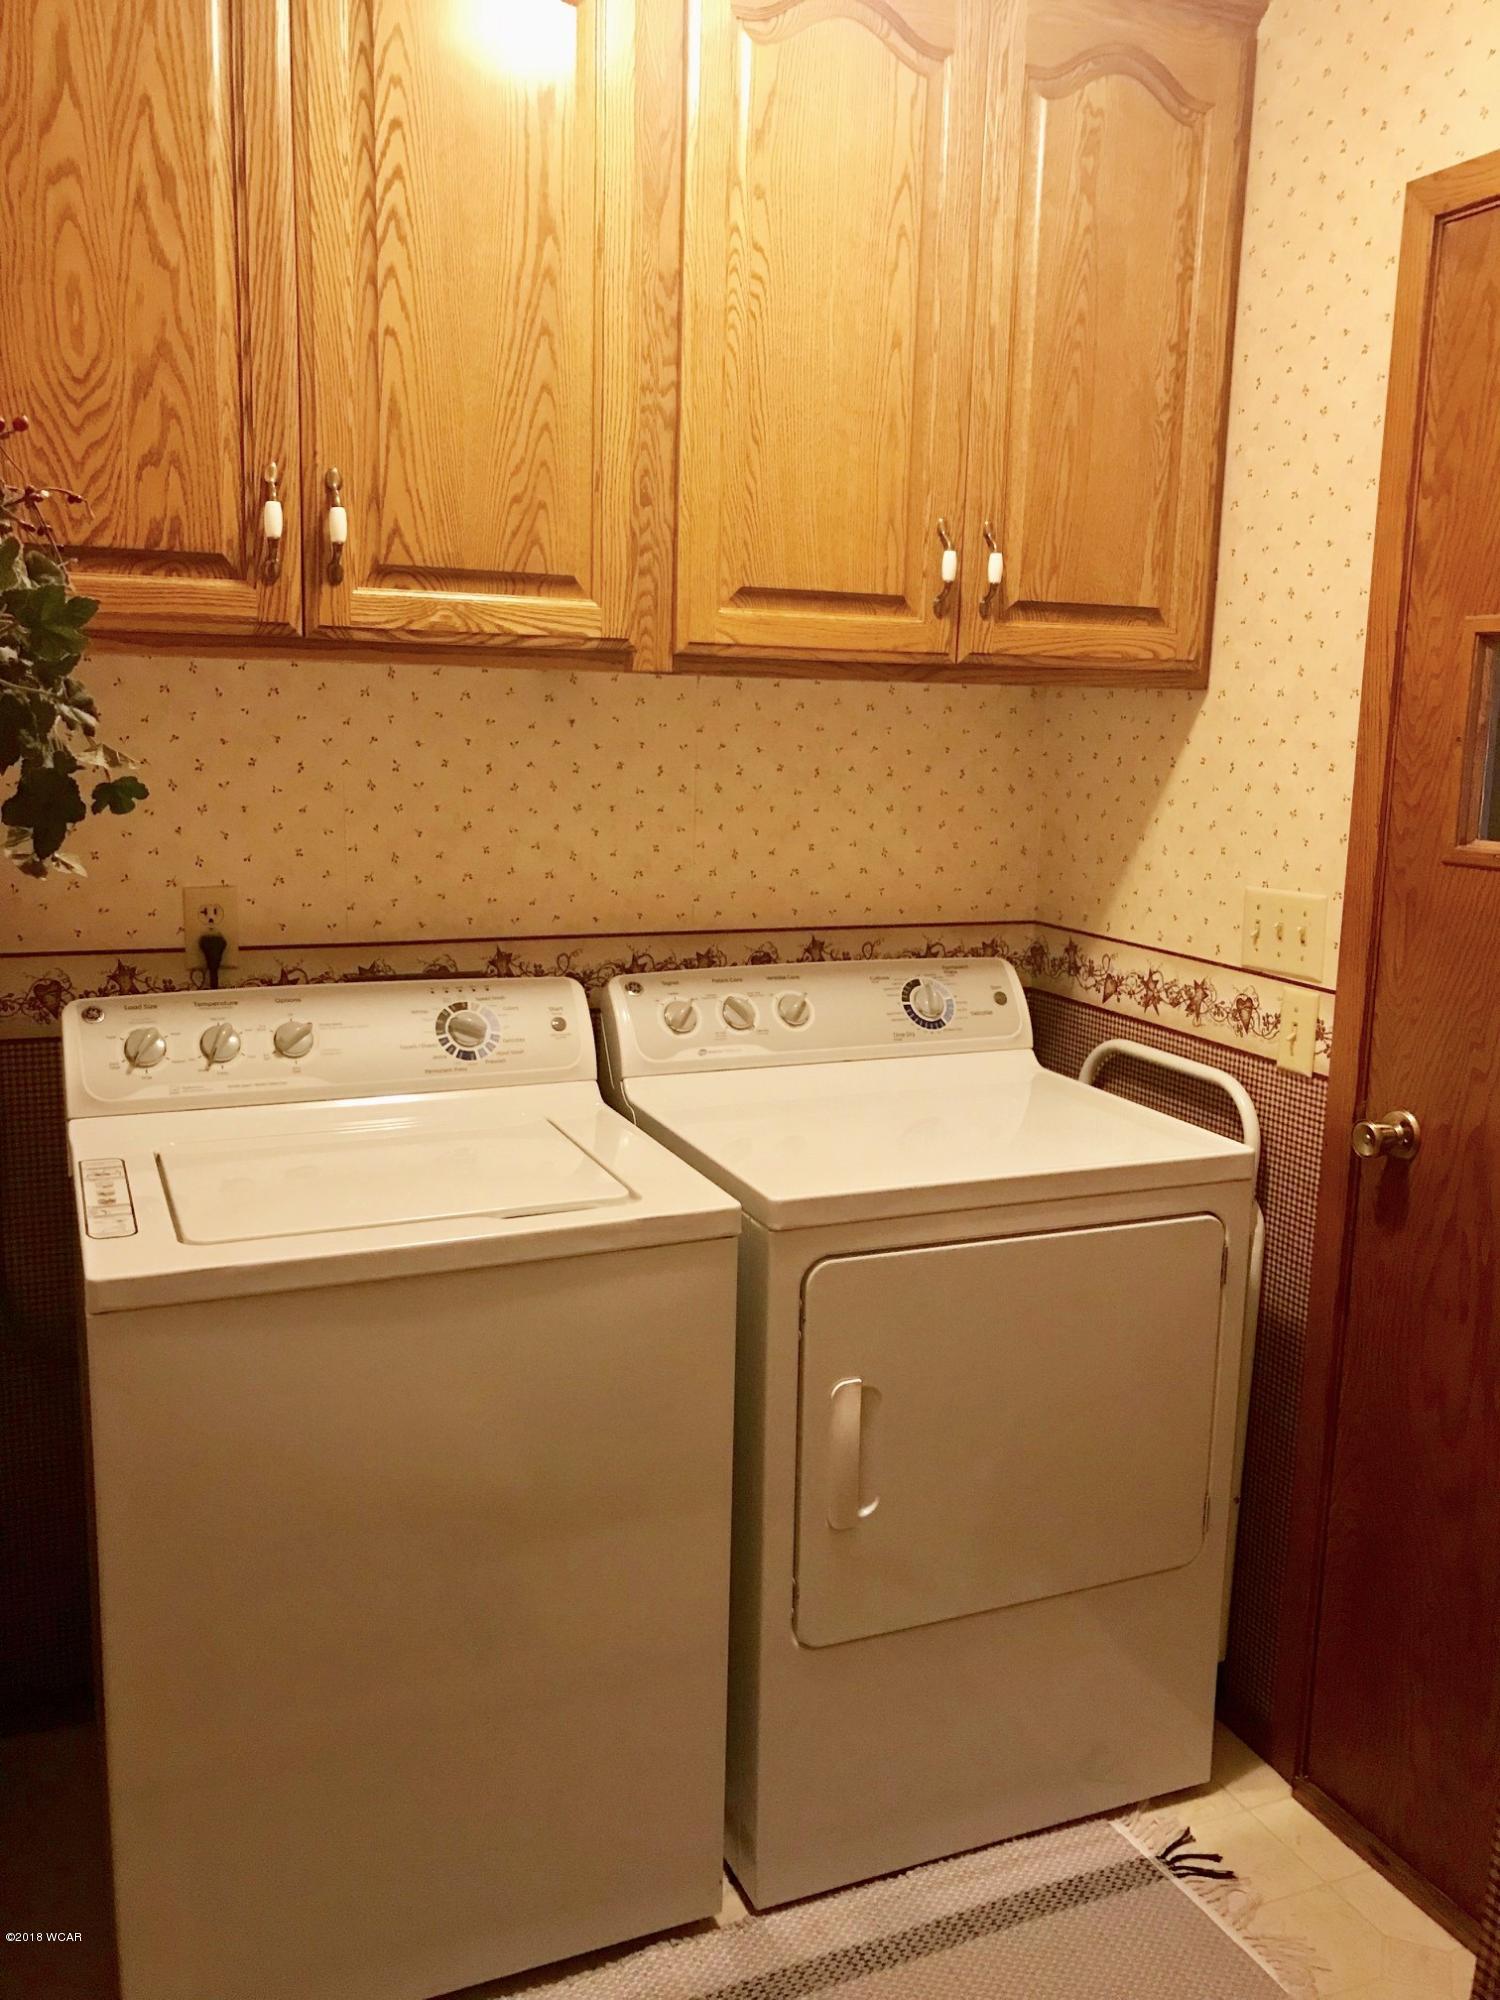 3956 189 Avenue,New London,3 Bedrooms Bedrooms,2 BathroomsBathrooms,Single Family,189 Avenue,6032267